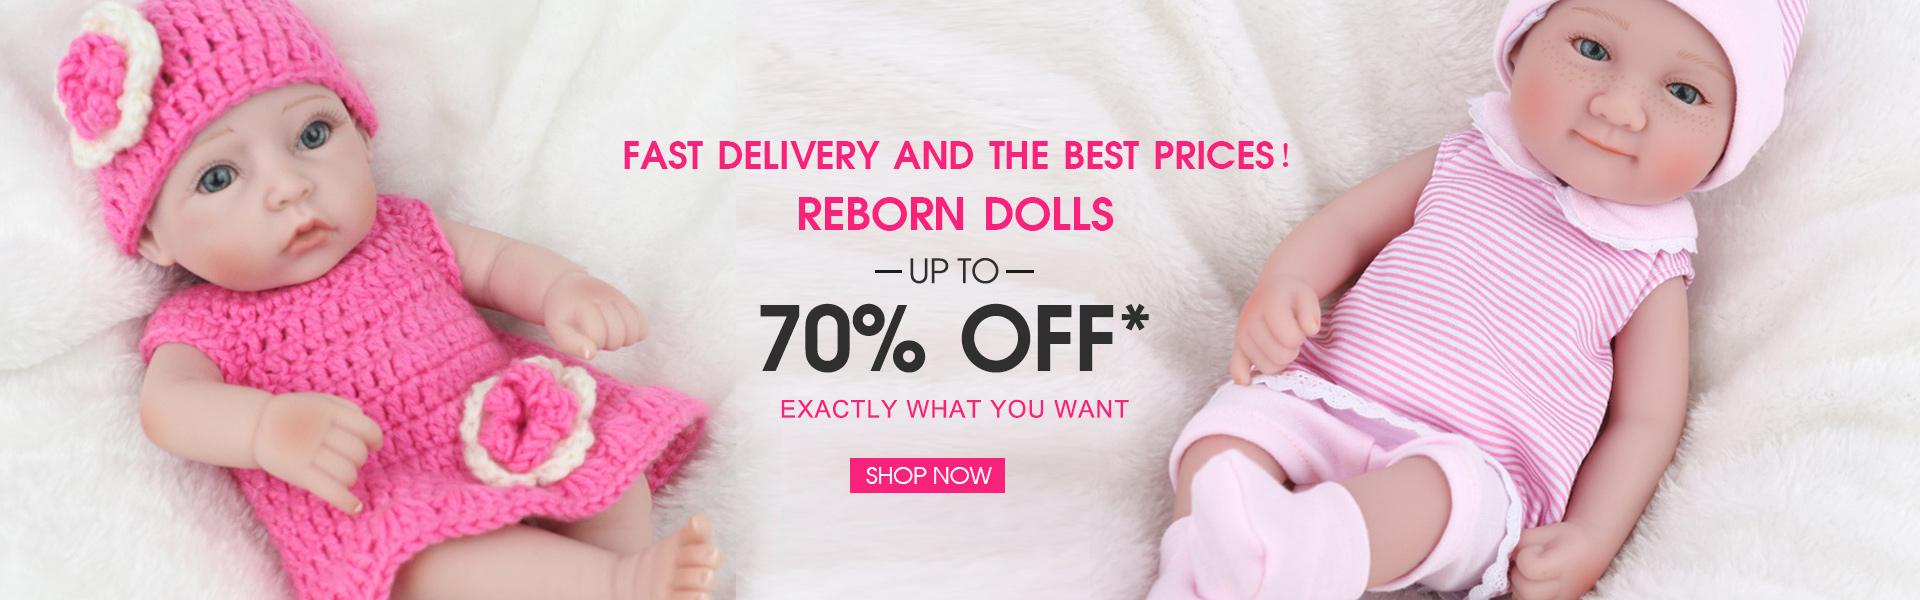 Rebornbuy.com Banner